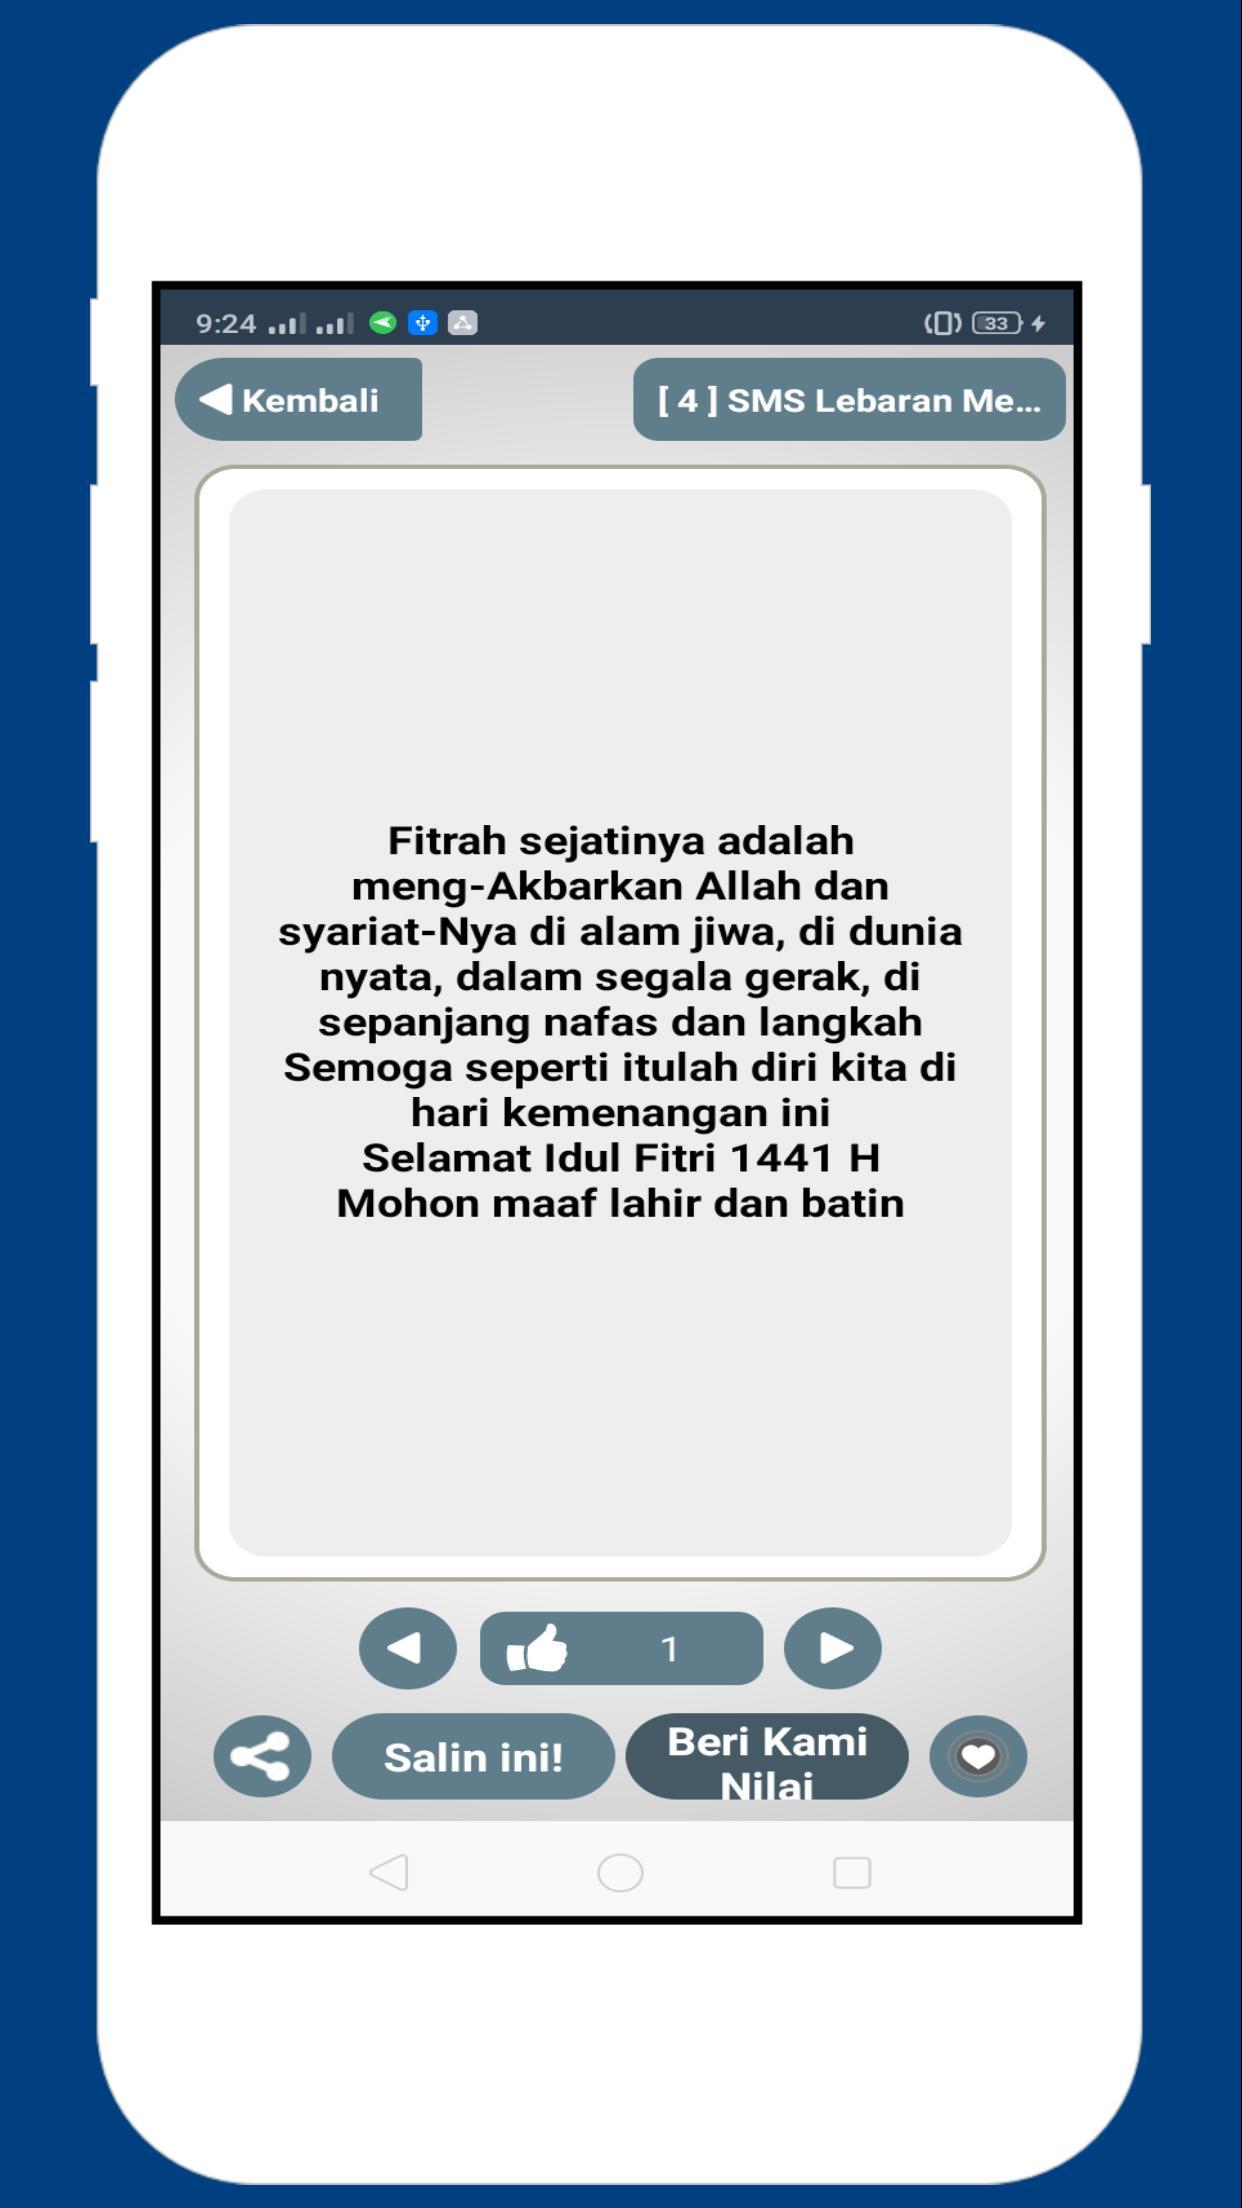 Ucapan Lebaran Idul Adha 2020 Sms Lebaran For Android Apk Download